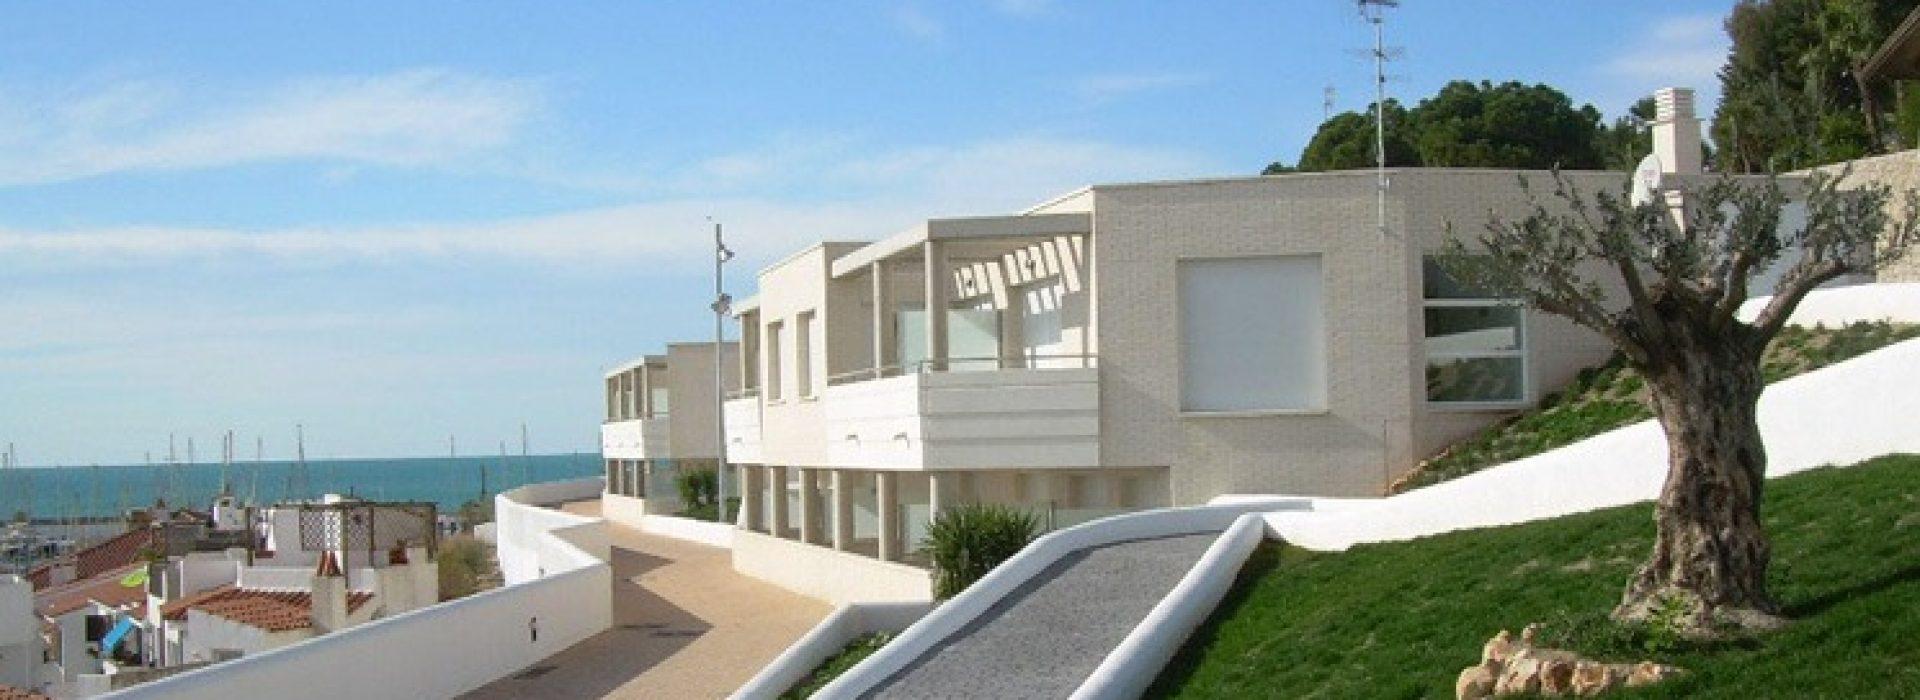 residencial-aiguadolç01